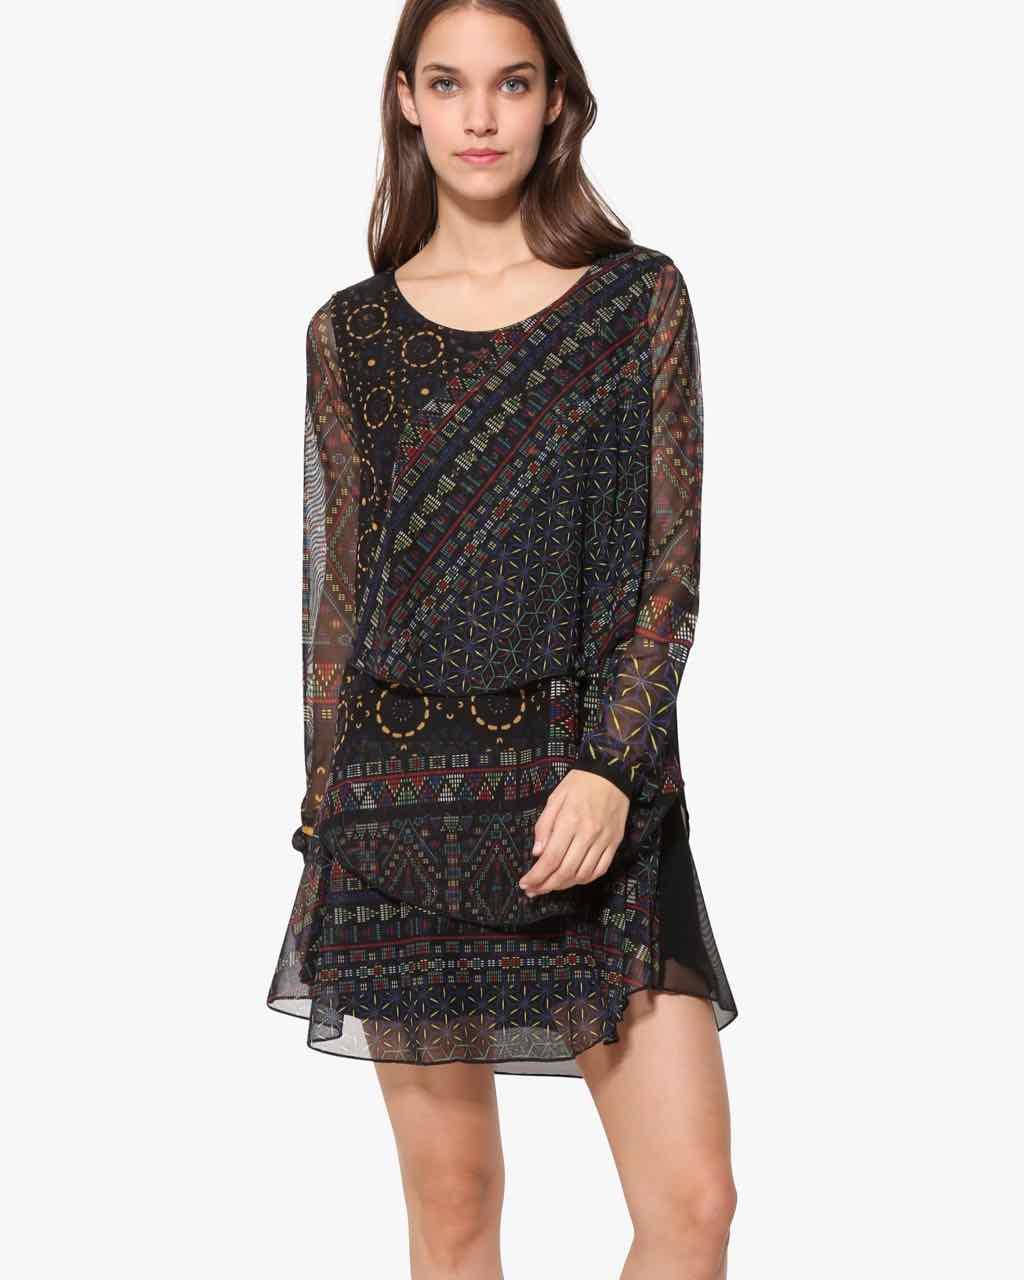 17WWVKC0_2000 Desigual Dress Capas Buy Online